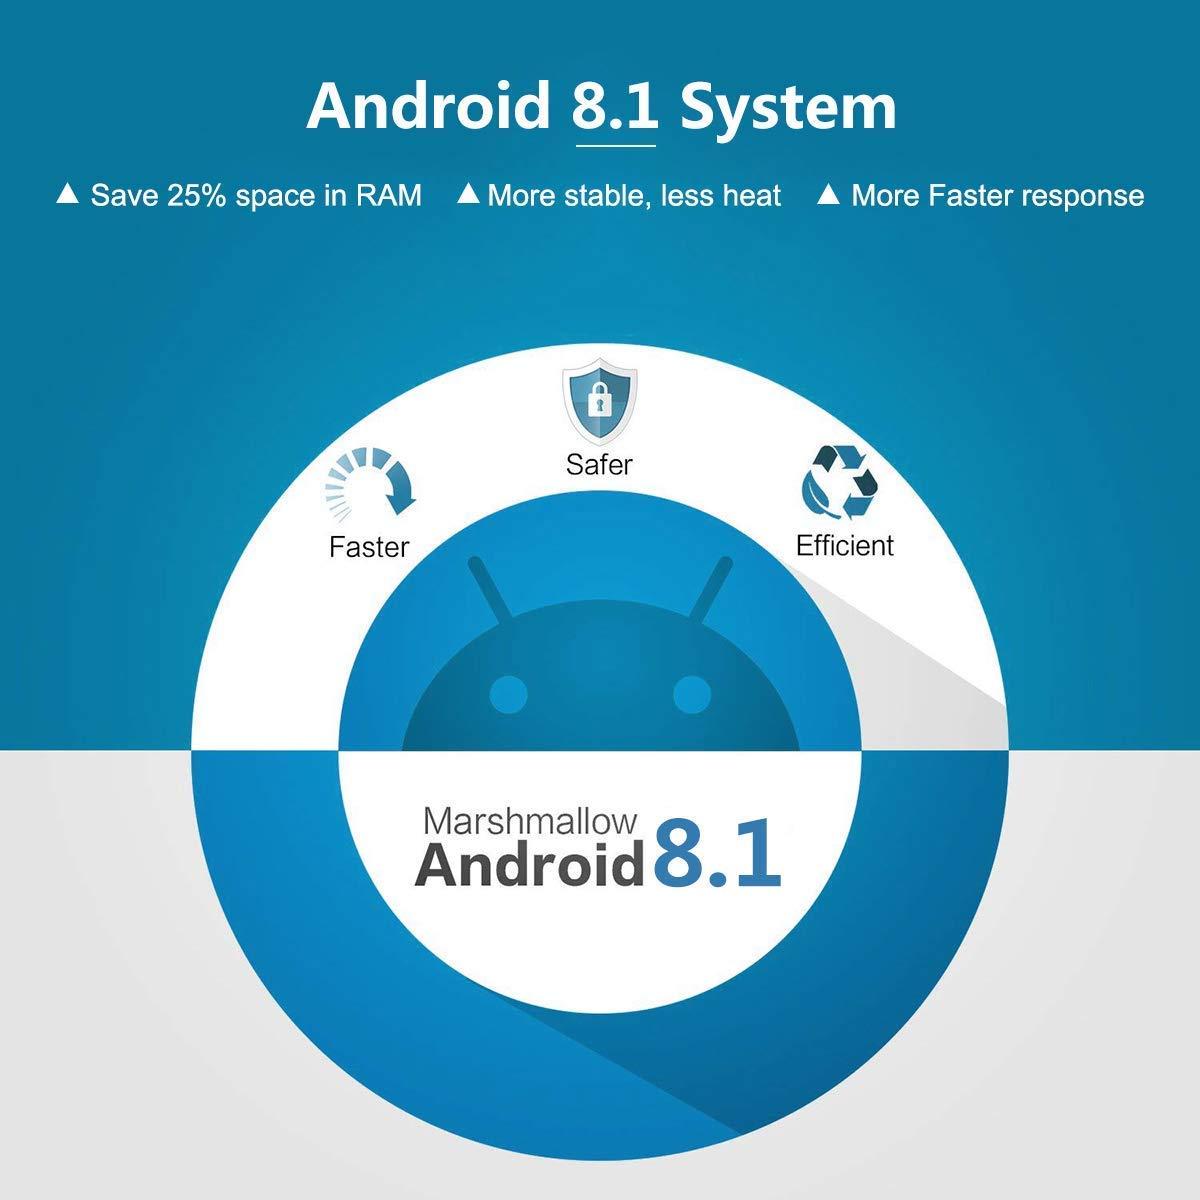 Amazon.com: T9 Android 8.1 TV Box 4GB DDR3 RAM 64GB ROM RK3328 Bluetooth 4.1 Quad-Core Cortex-A53 64 Bits Support 2.4/5.0GHz WiFi 4K 3D Ultra HD HDMI H.265: ...